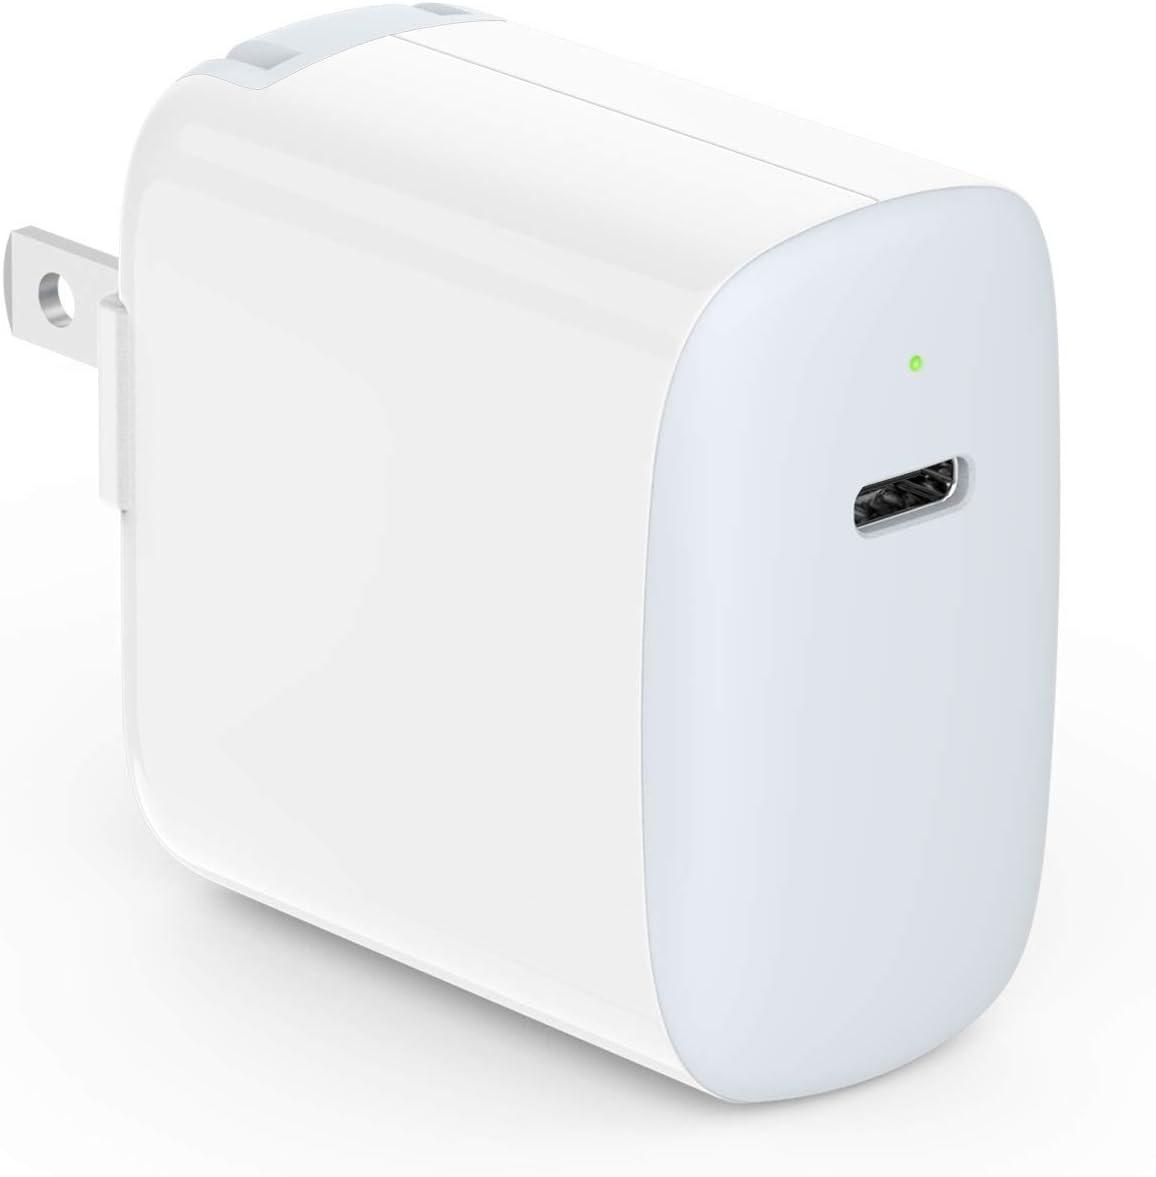 iPhone 12 Charger, 20W USB C Block for iPhone 12, 12 Pro, 12 Pro Max, 12 Mini, Magsafe Wireless Charger, 11, 11 Pro, SE, XR, XS, X, 8 Plus, iPad Pro 12.9, 11, iPad 8/7, iPad Air 4/3, LED, Foldable